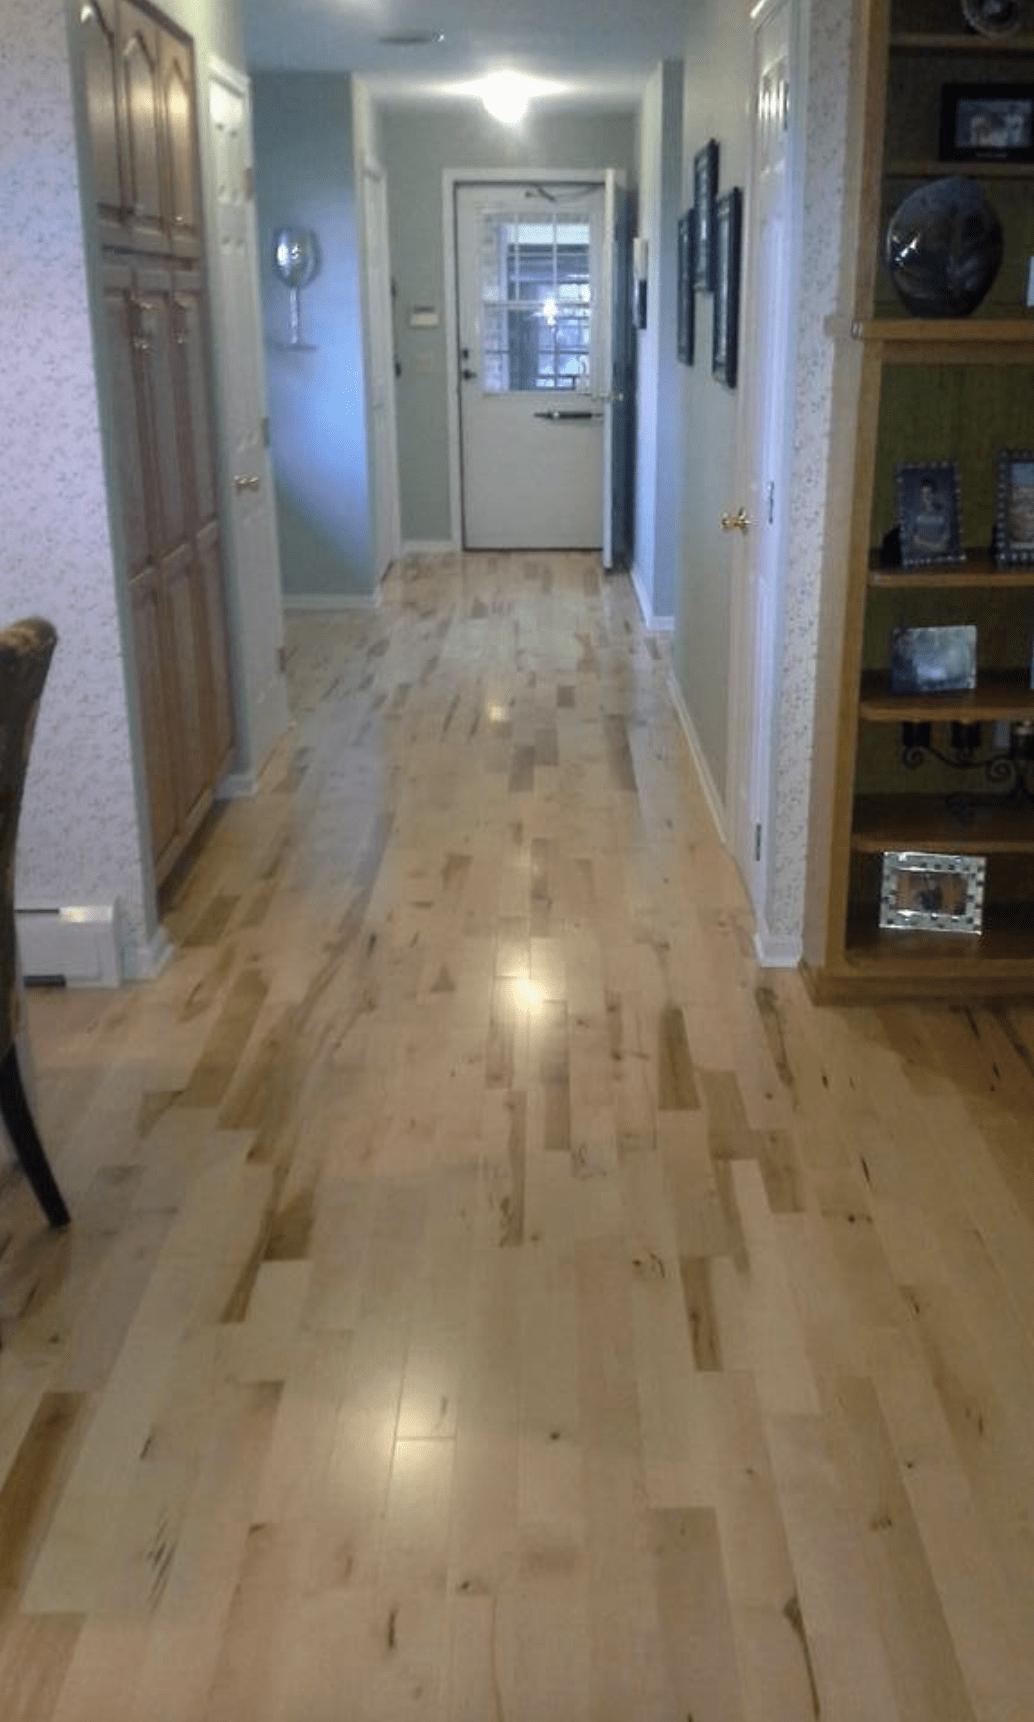 Hardwood flooring from Charles Tyre Flooring in Bear, DE